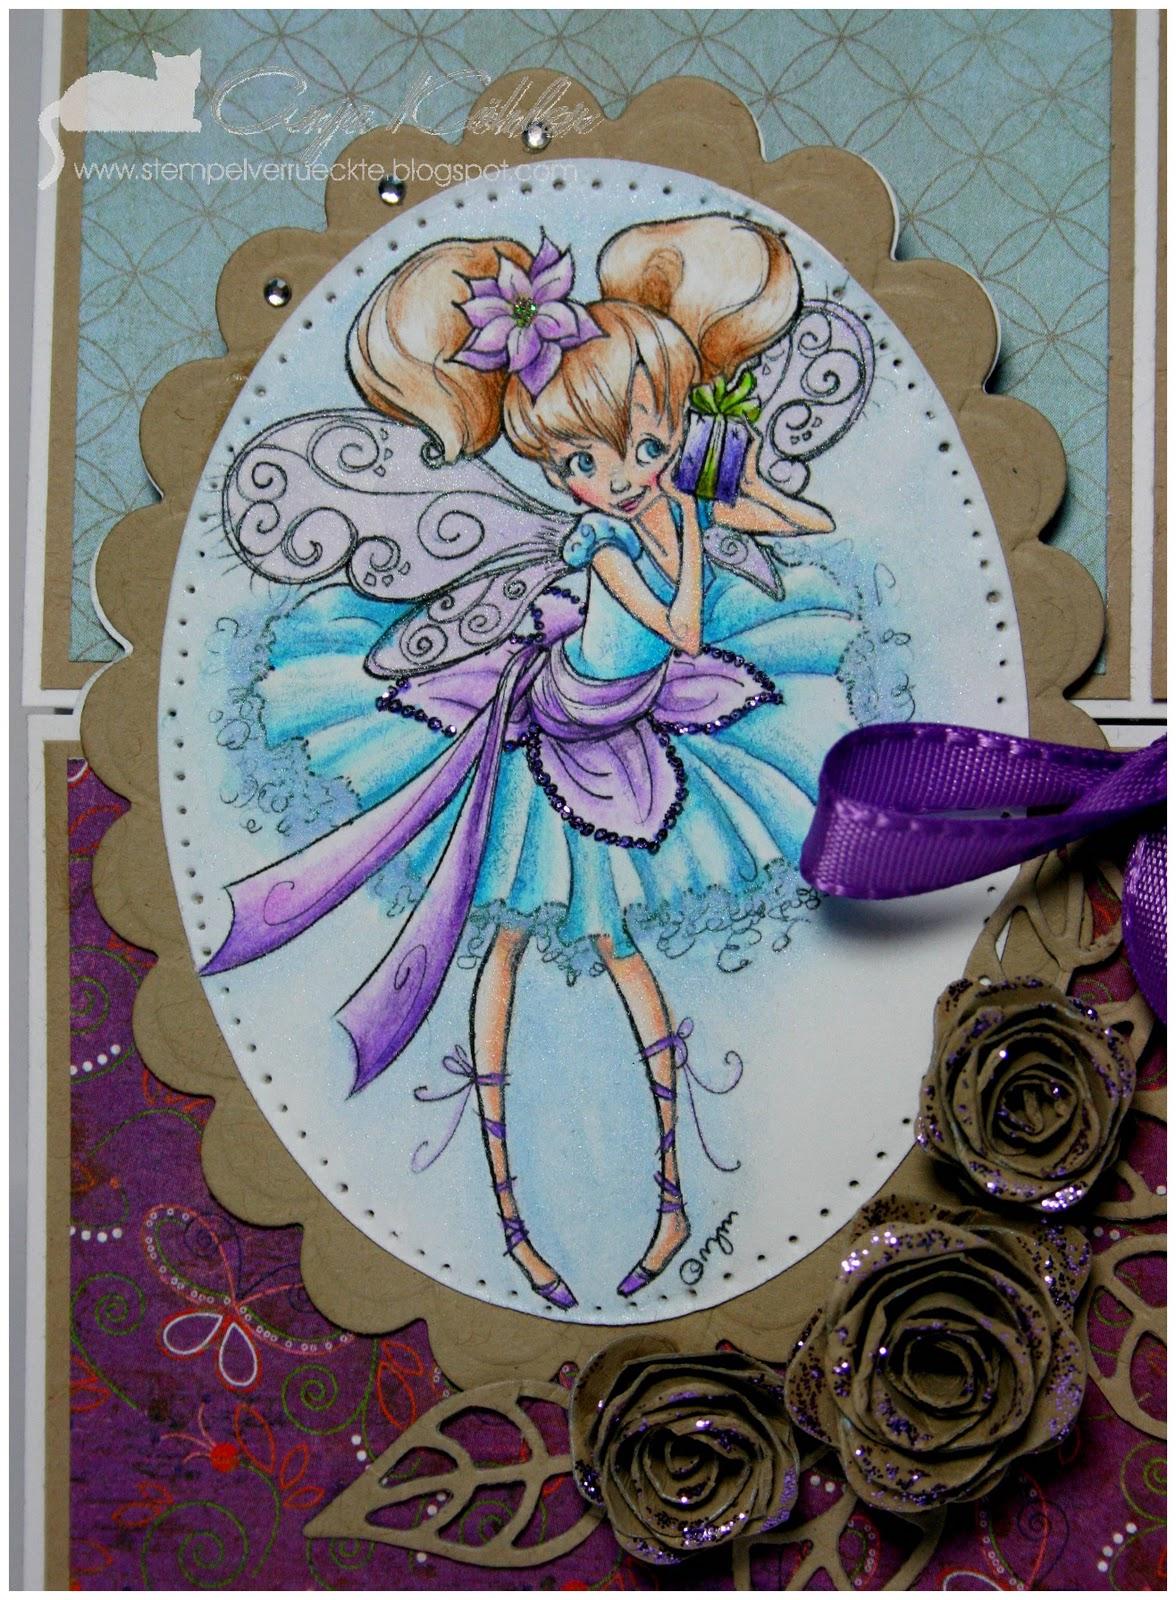 Teen Fairy zum Teenie-Geburtstag